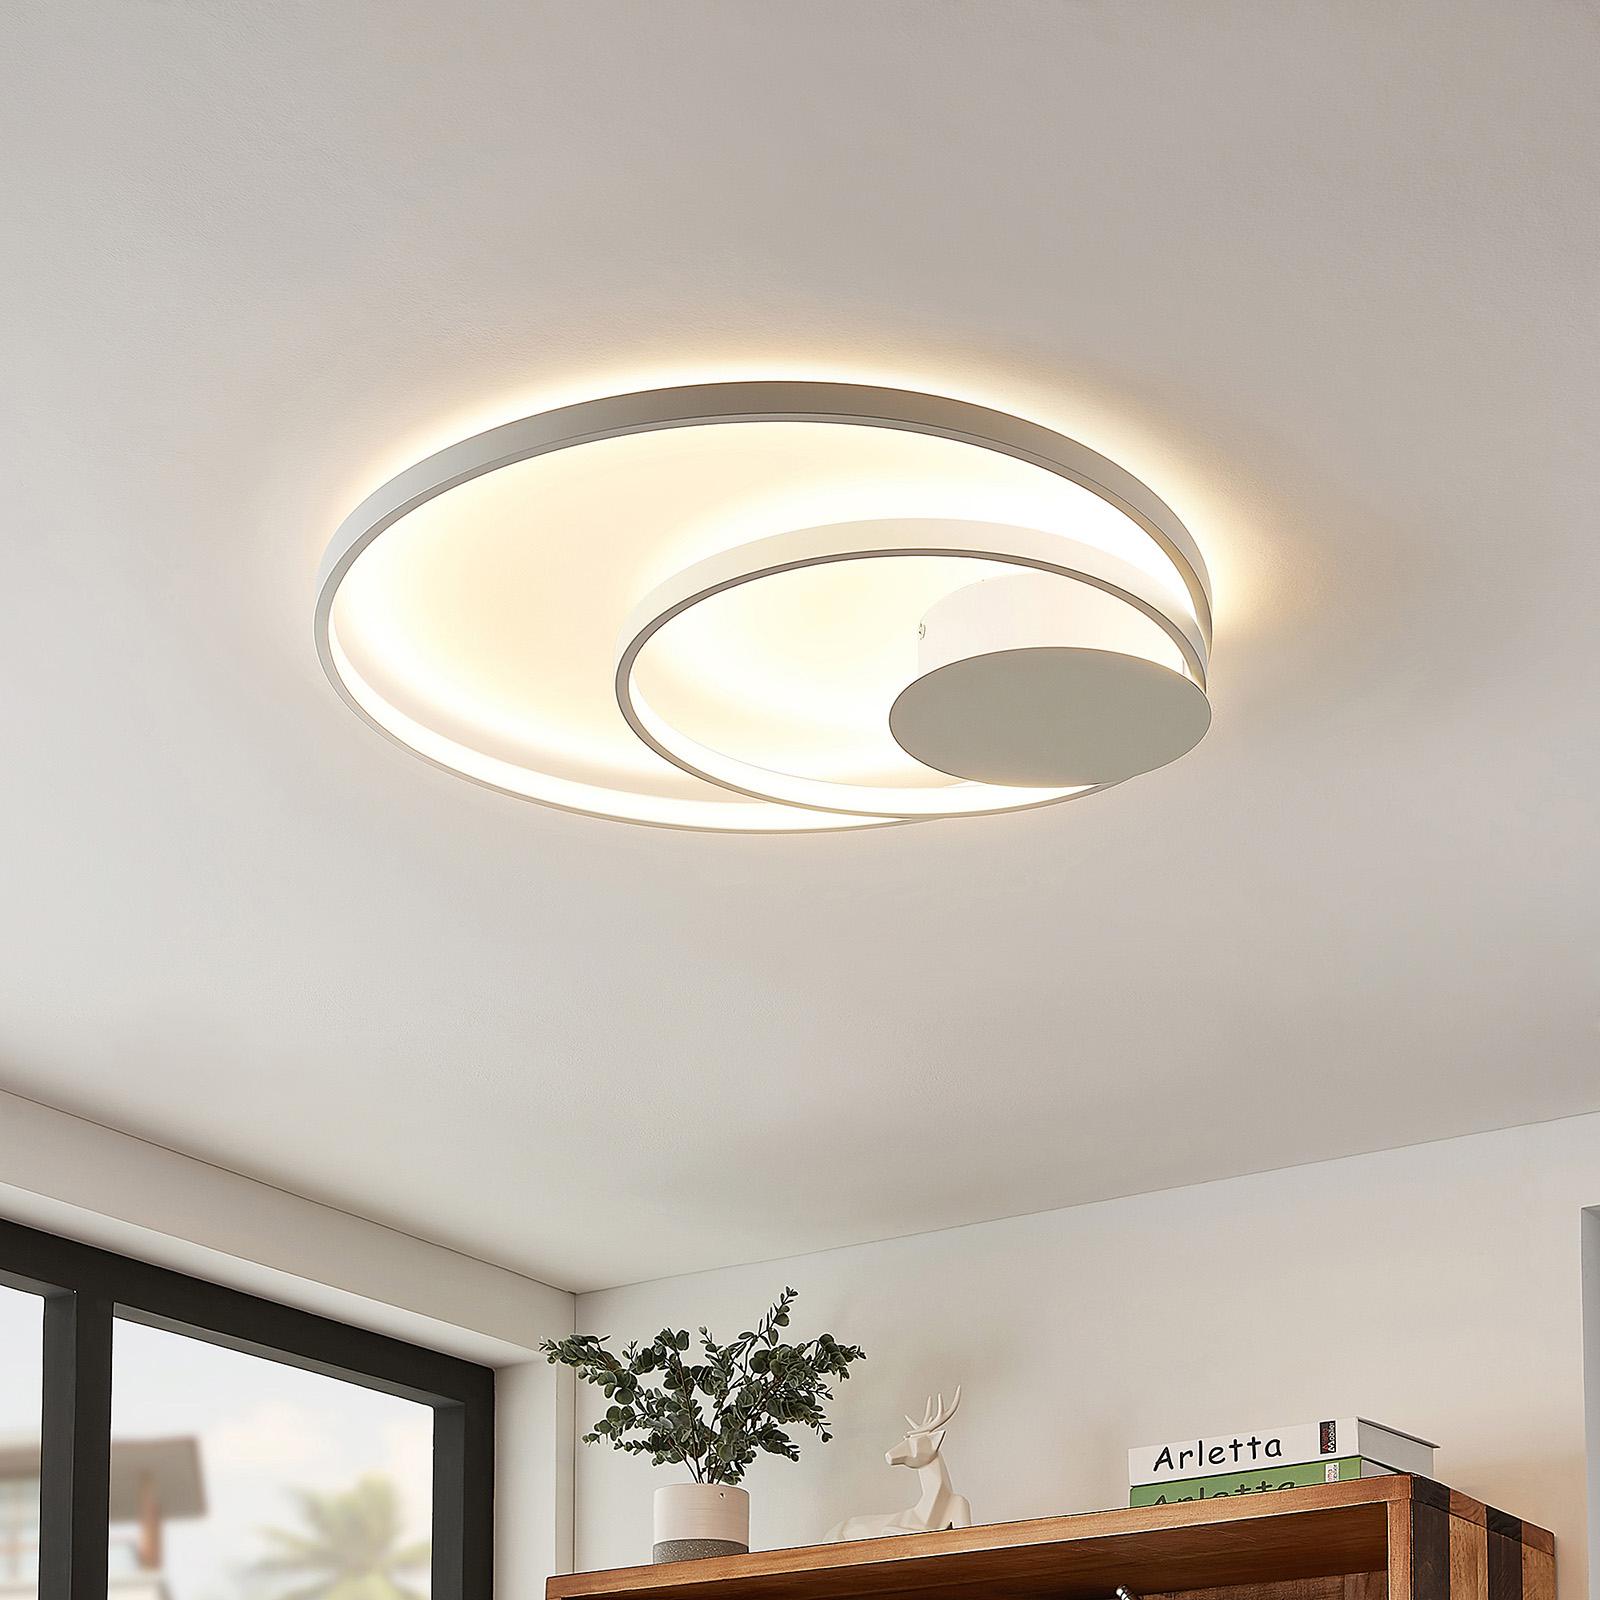 Lindby Nerwin plafón LED, redondo, blanco